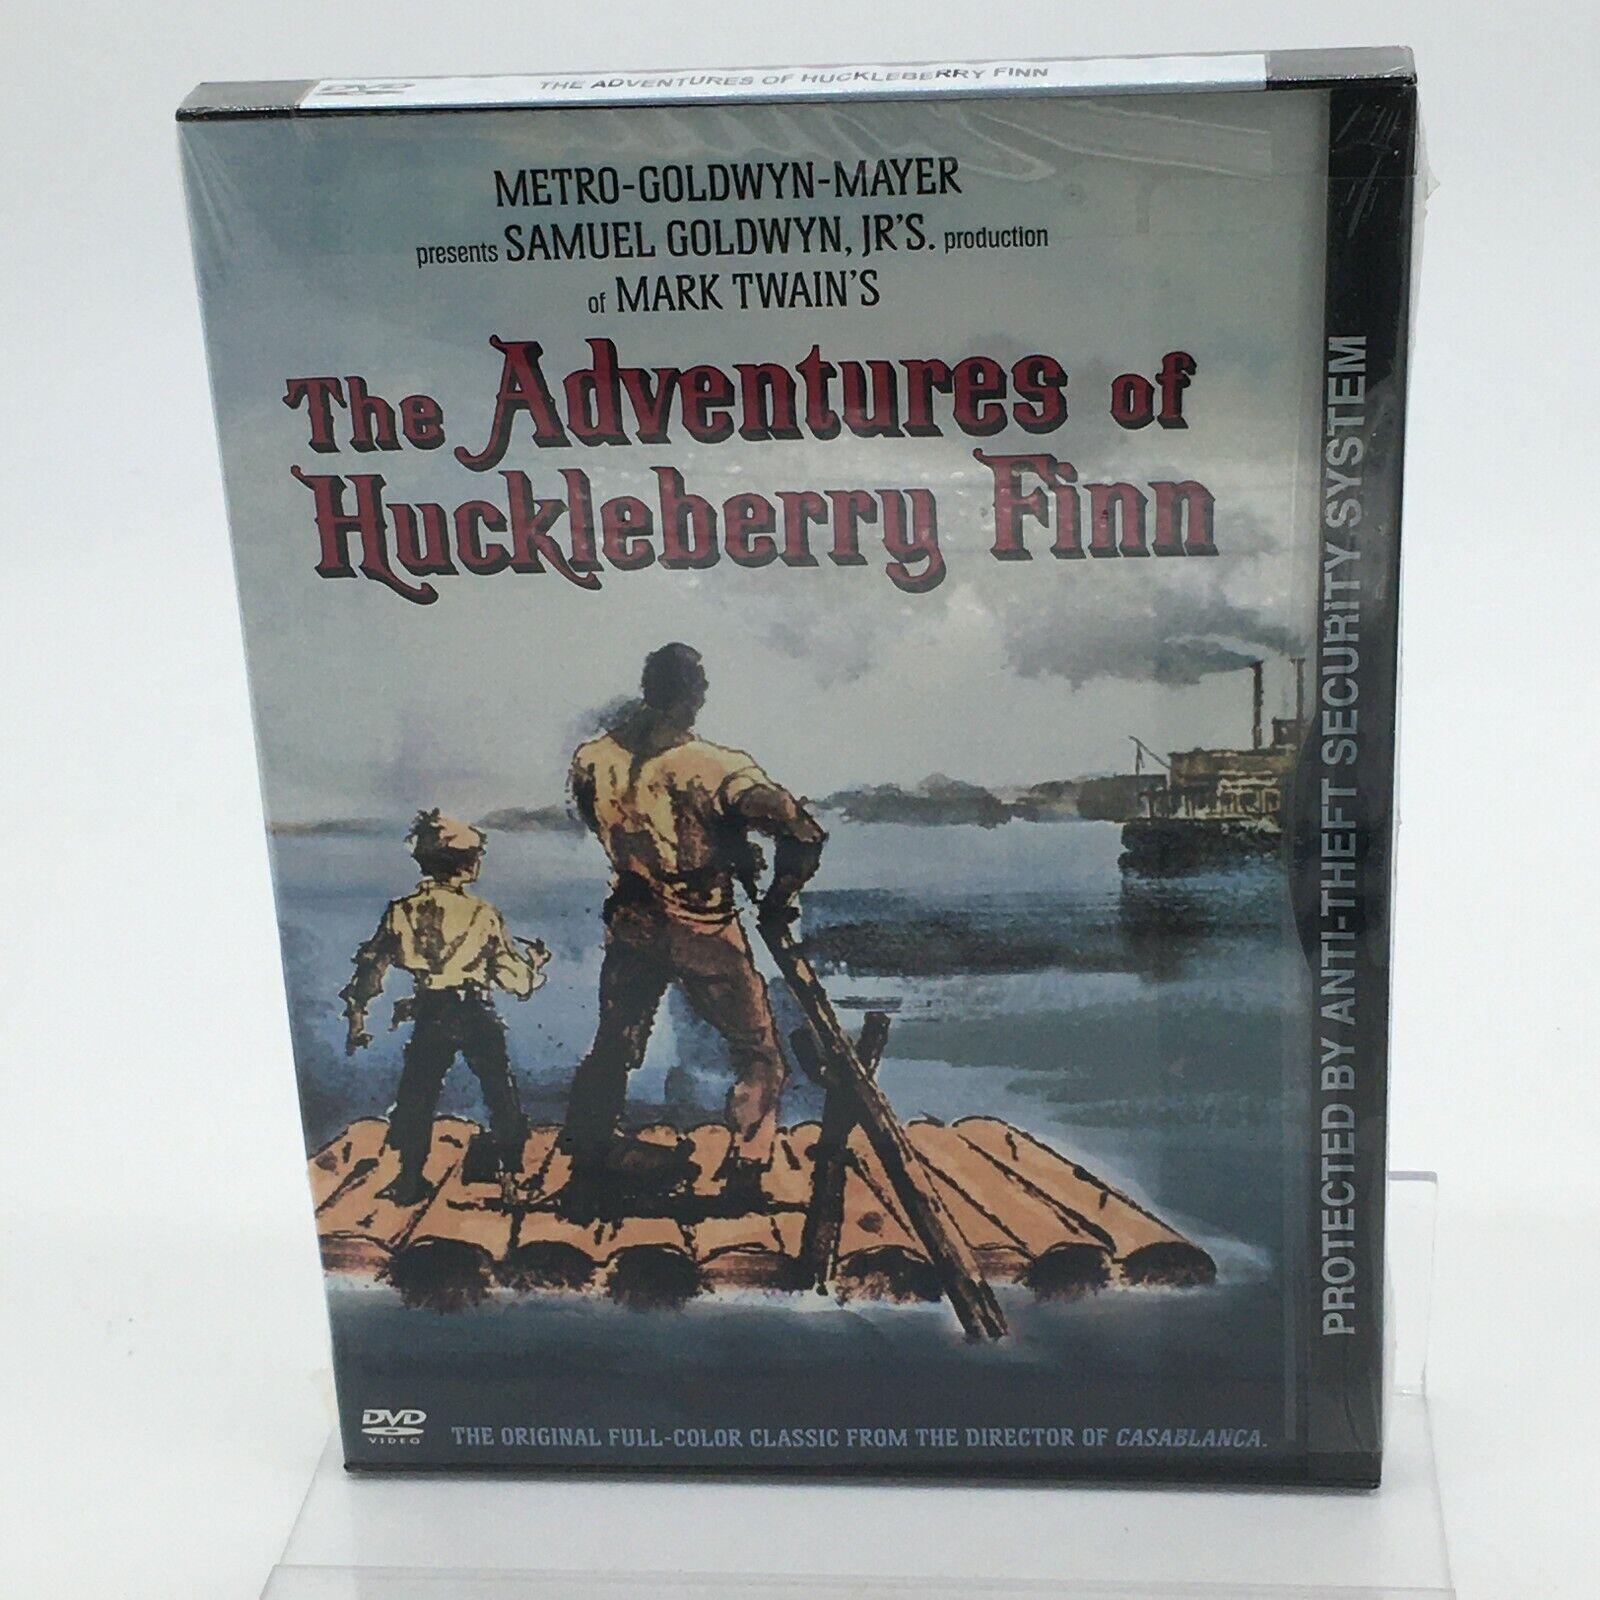 The Adventures Of Huckleberry Finn DVD, 2003 Region 1 New RARE SNAPCASE SEALED - $16.99